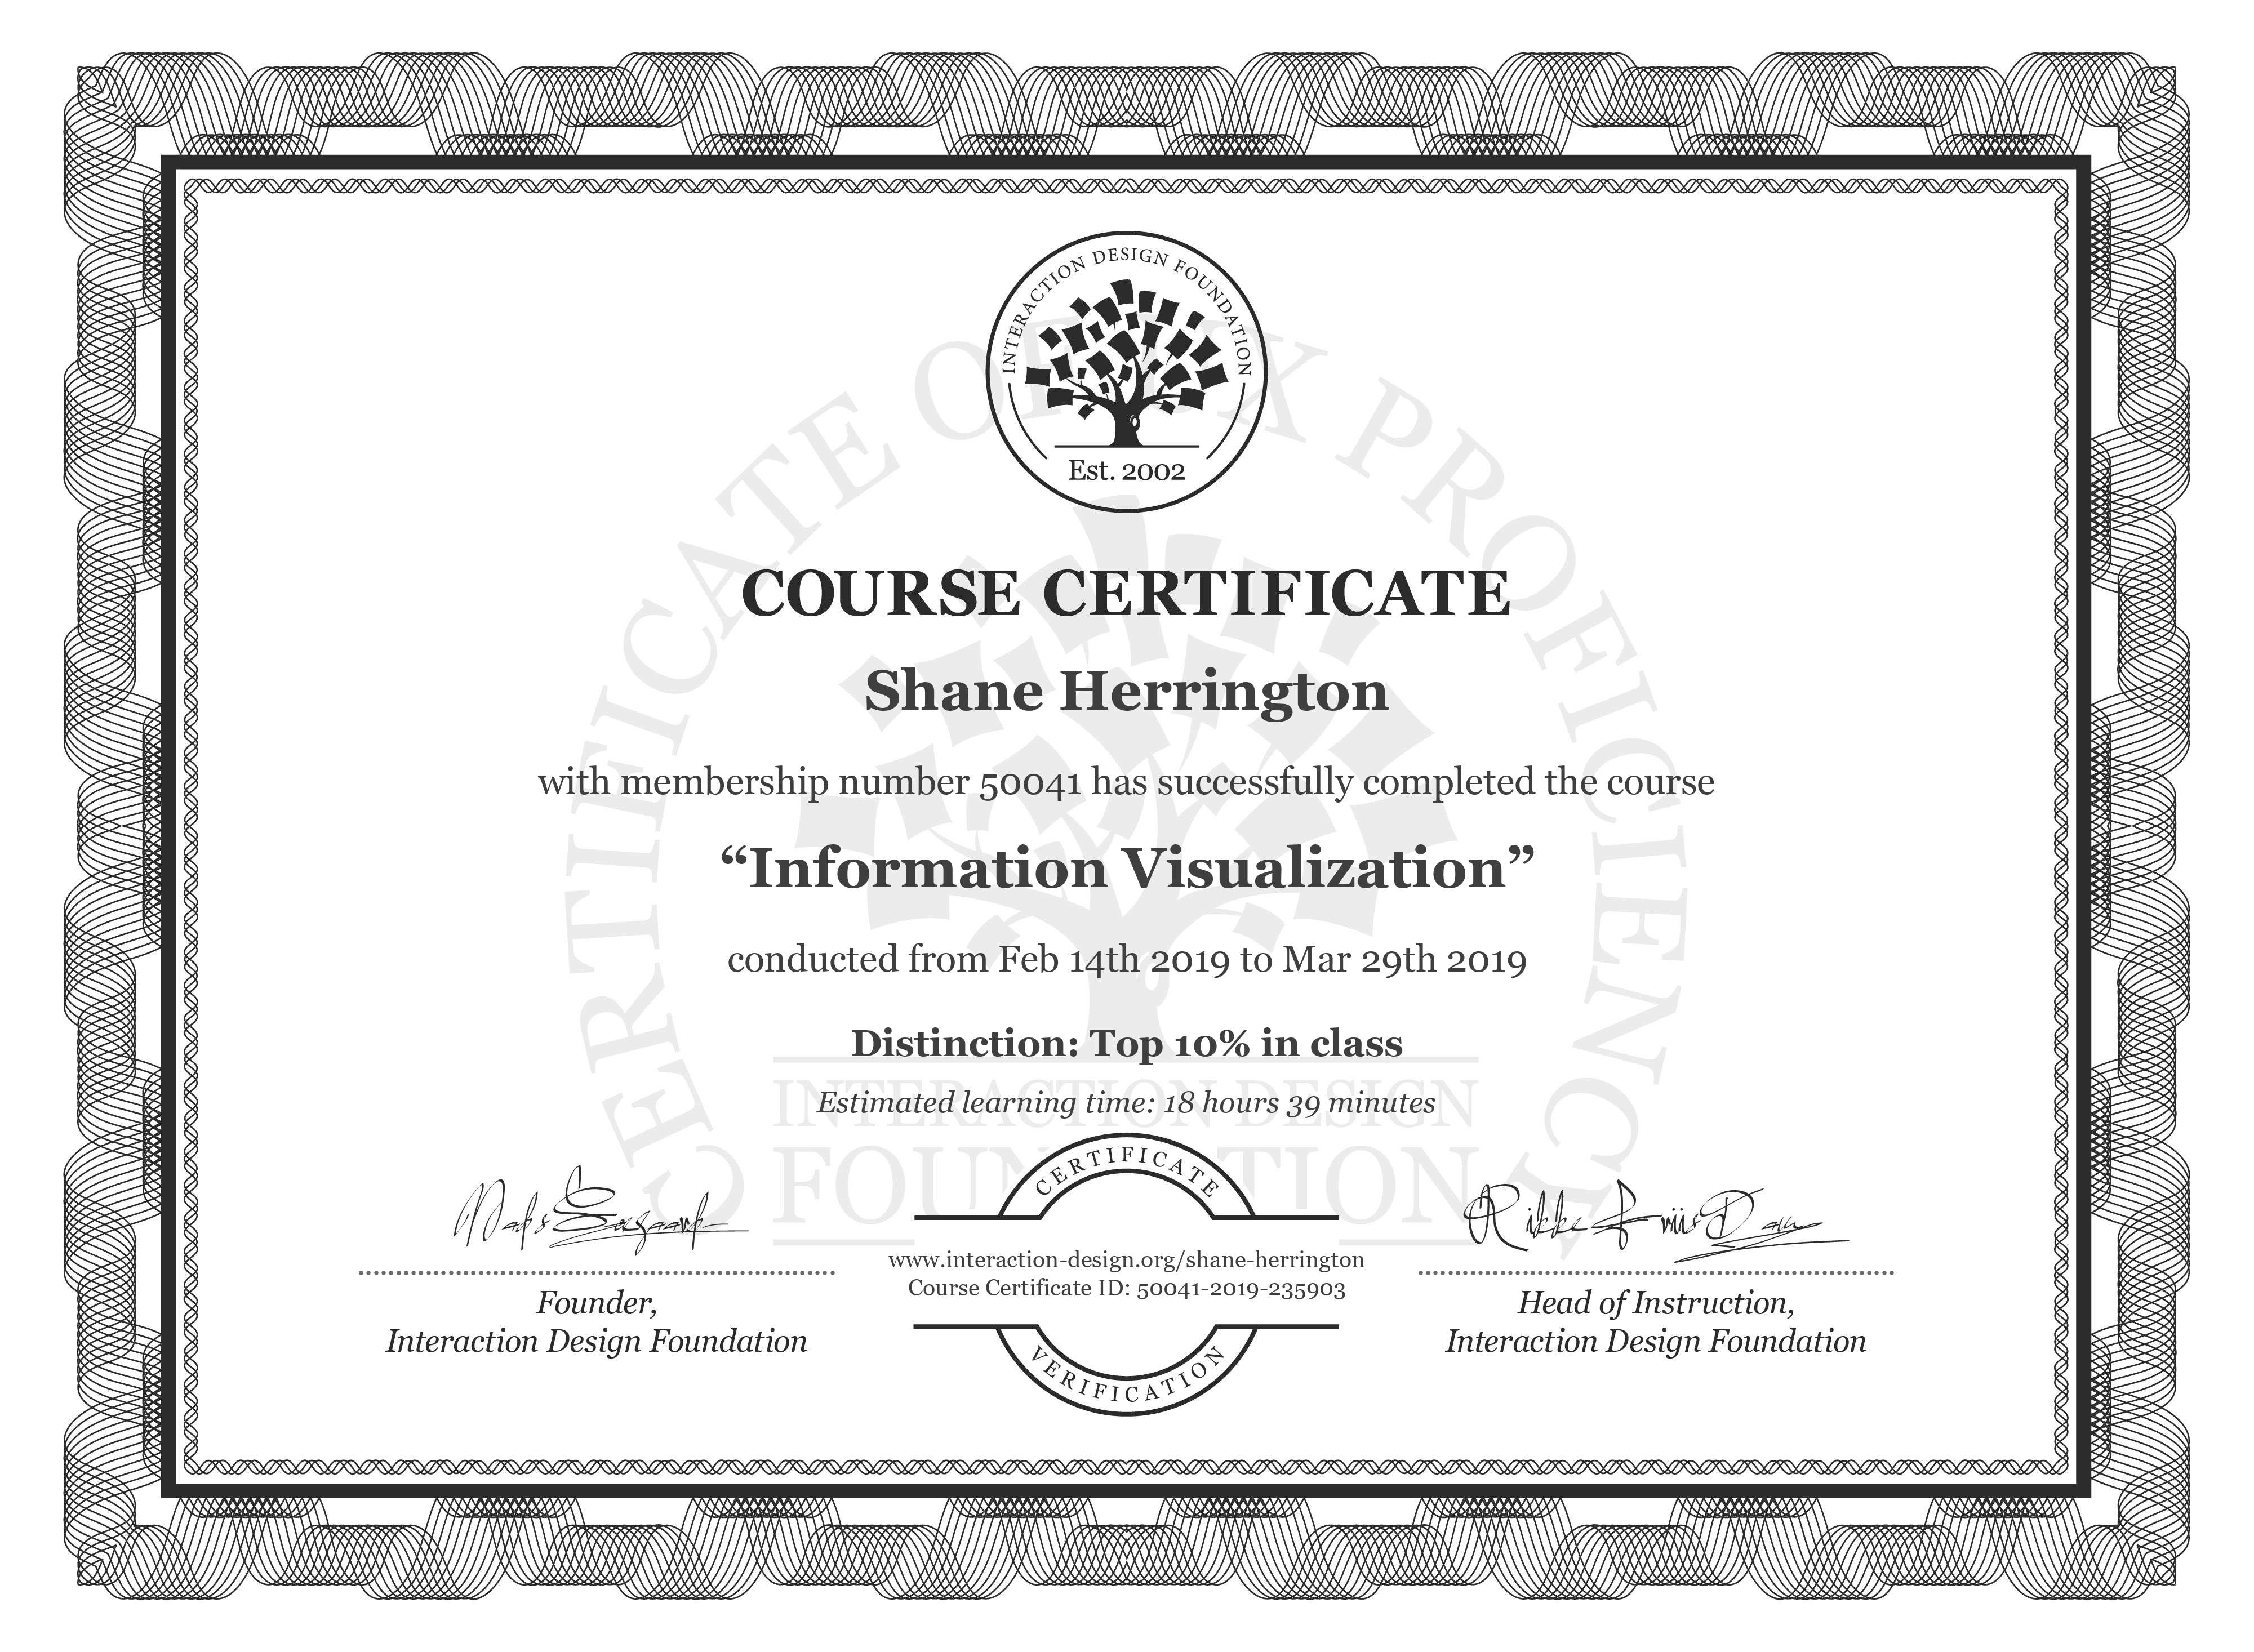 Shane Herrington: Course Certificate - Information Visualization